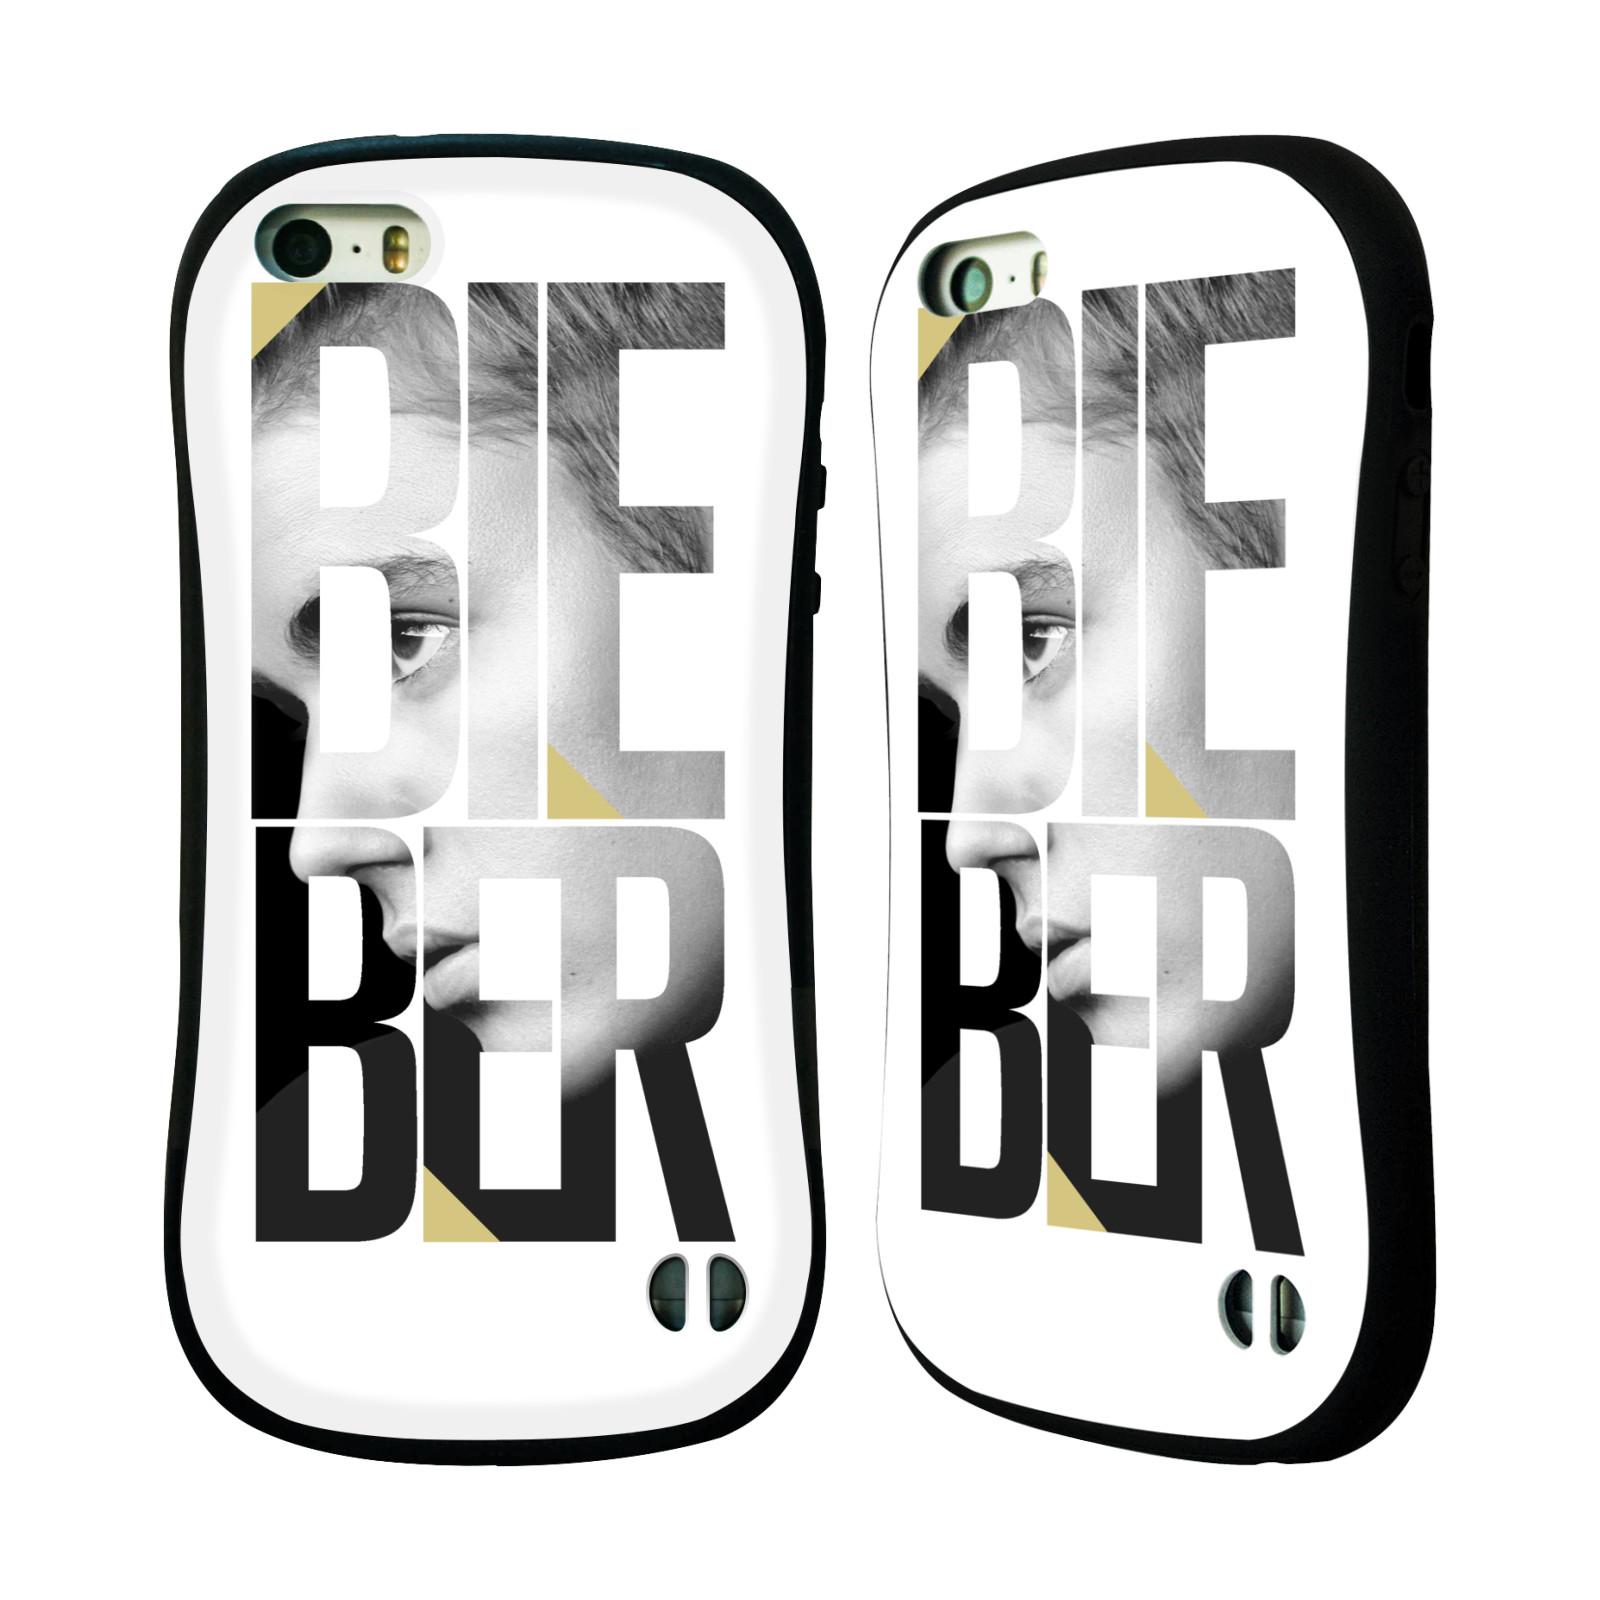 HEAD CASE silikon/plast odolný obal na mobil Apple Iphone 5 / 5S originální potisk Justin Bieber nadpis fotka